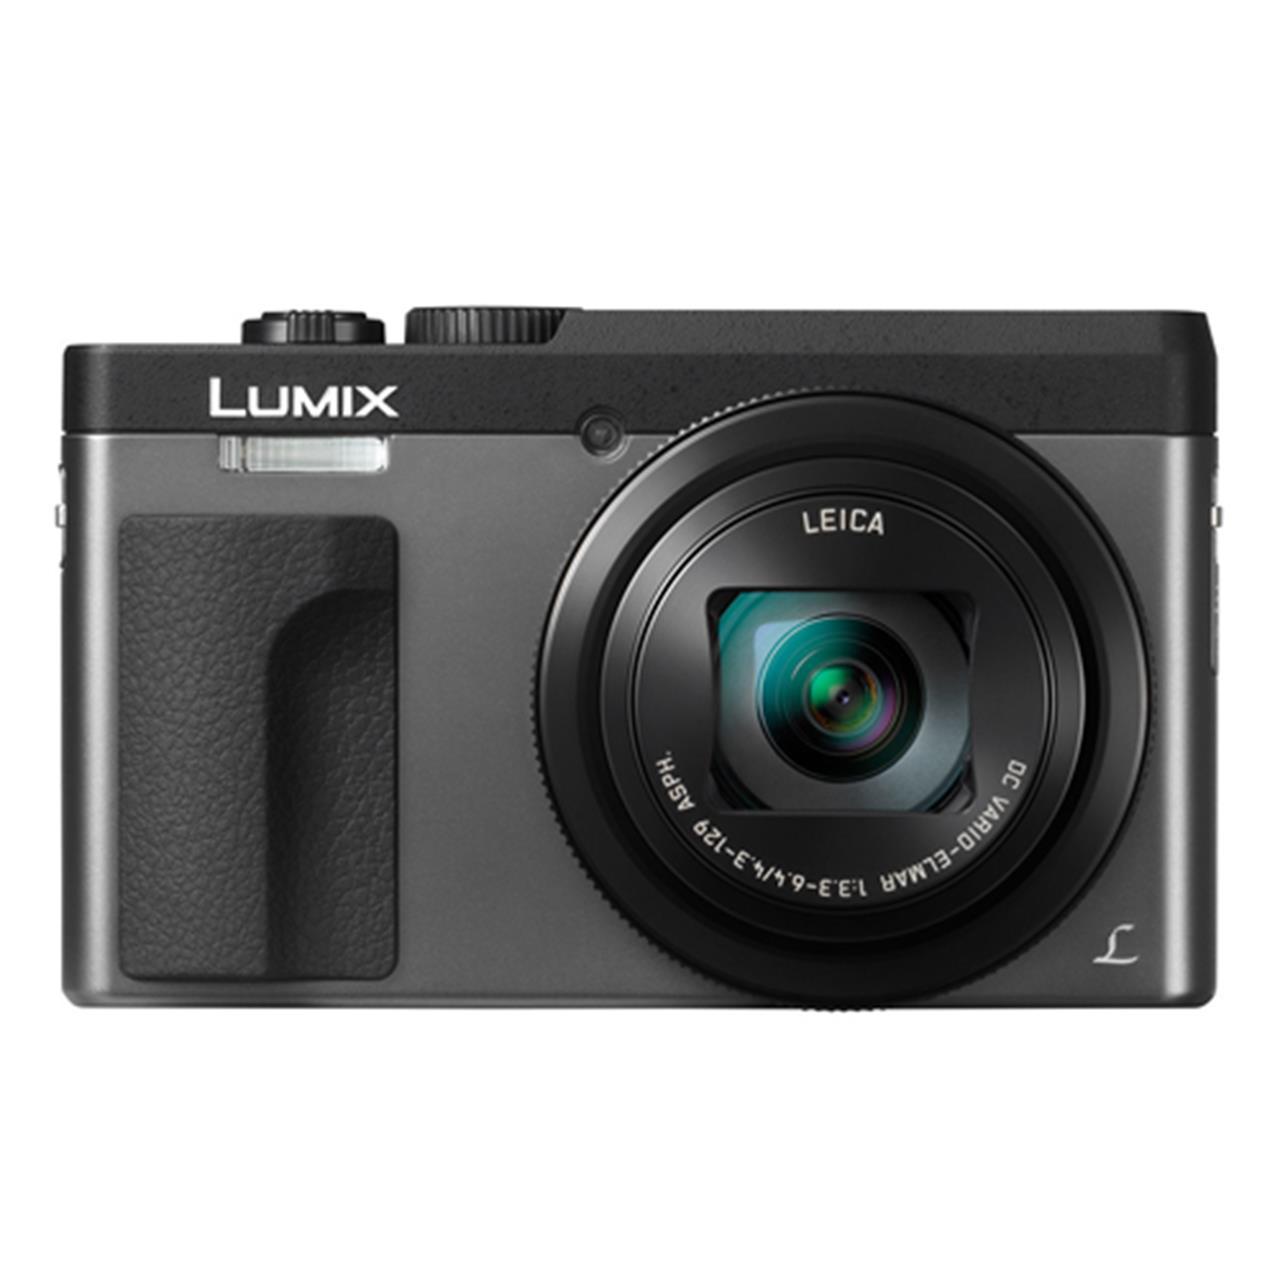 5025232867776__lumix_dmc_tz90_zilver_compact_camera_van_panasonic.jpg